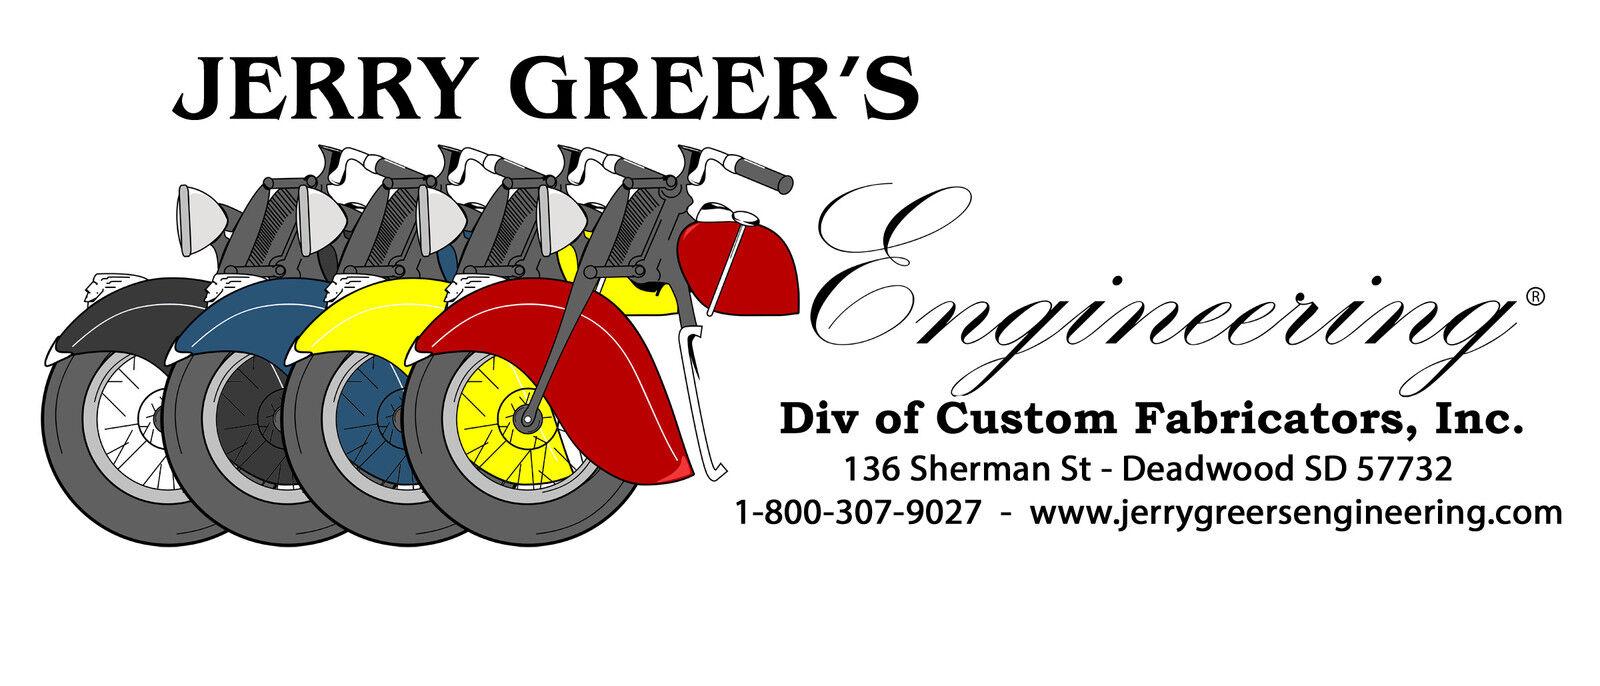 Jerry Greer s Engineering